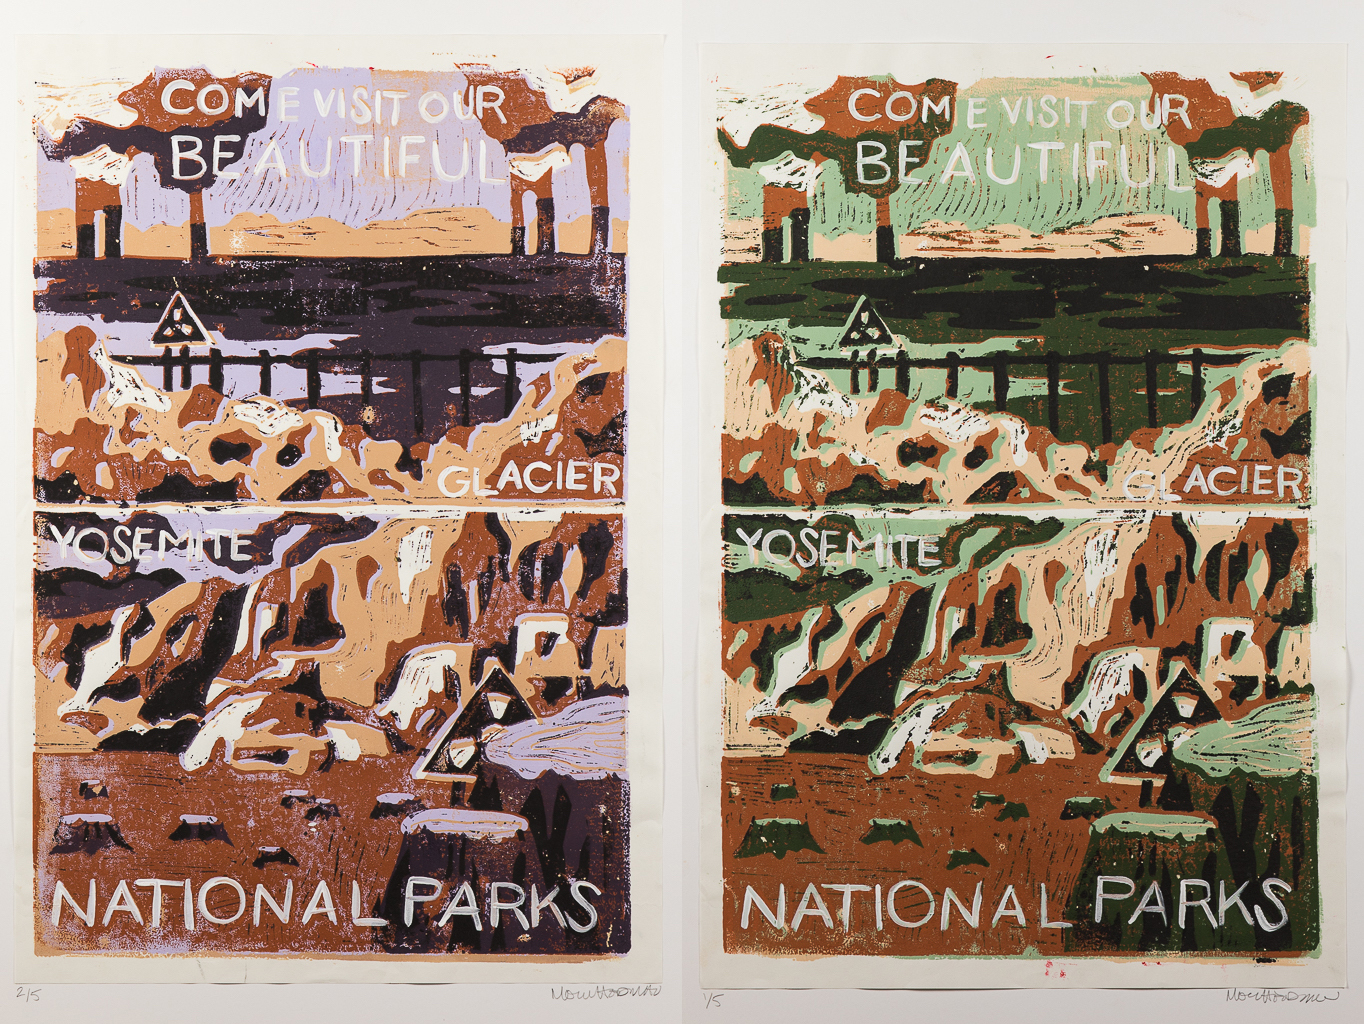 Natl+Parks+P_combined.jpg